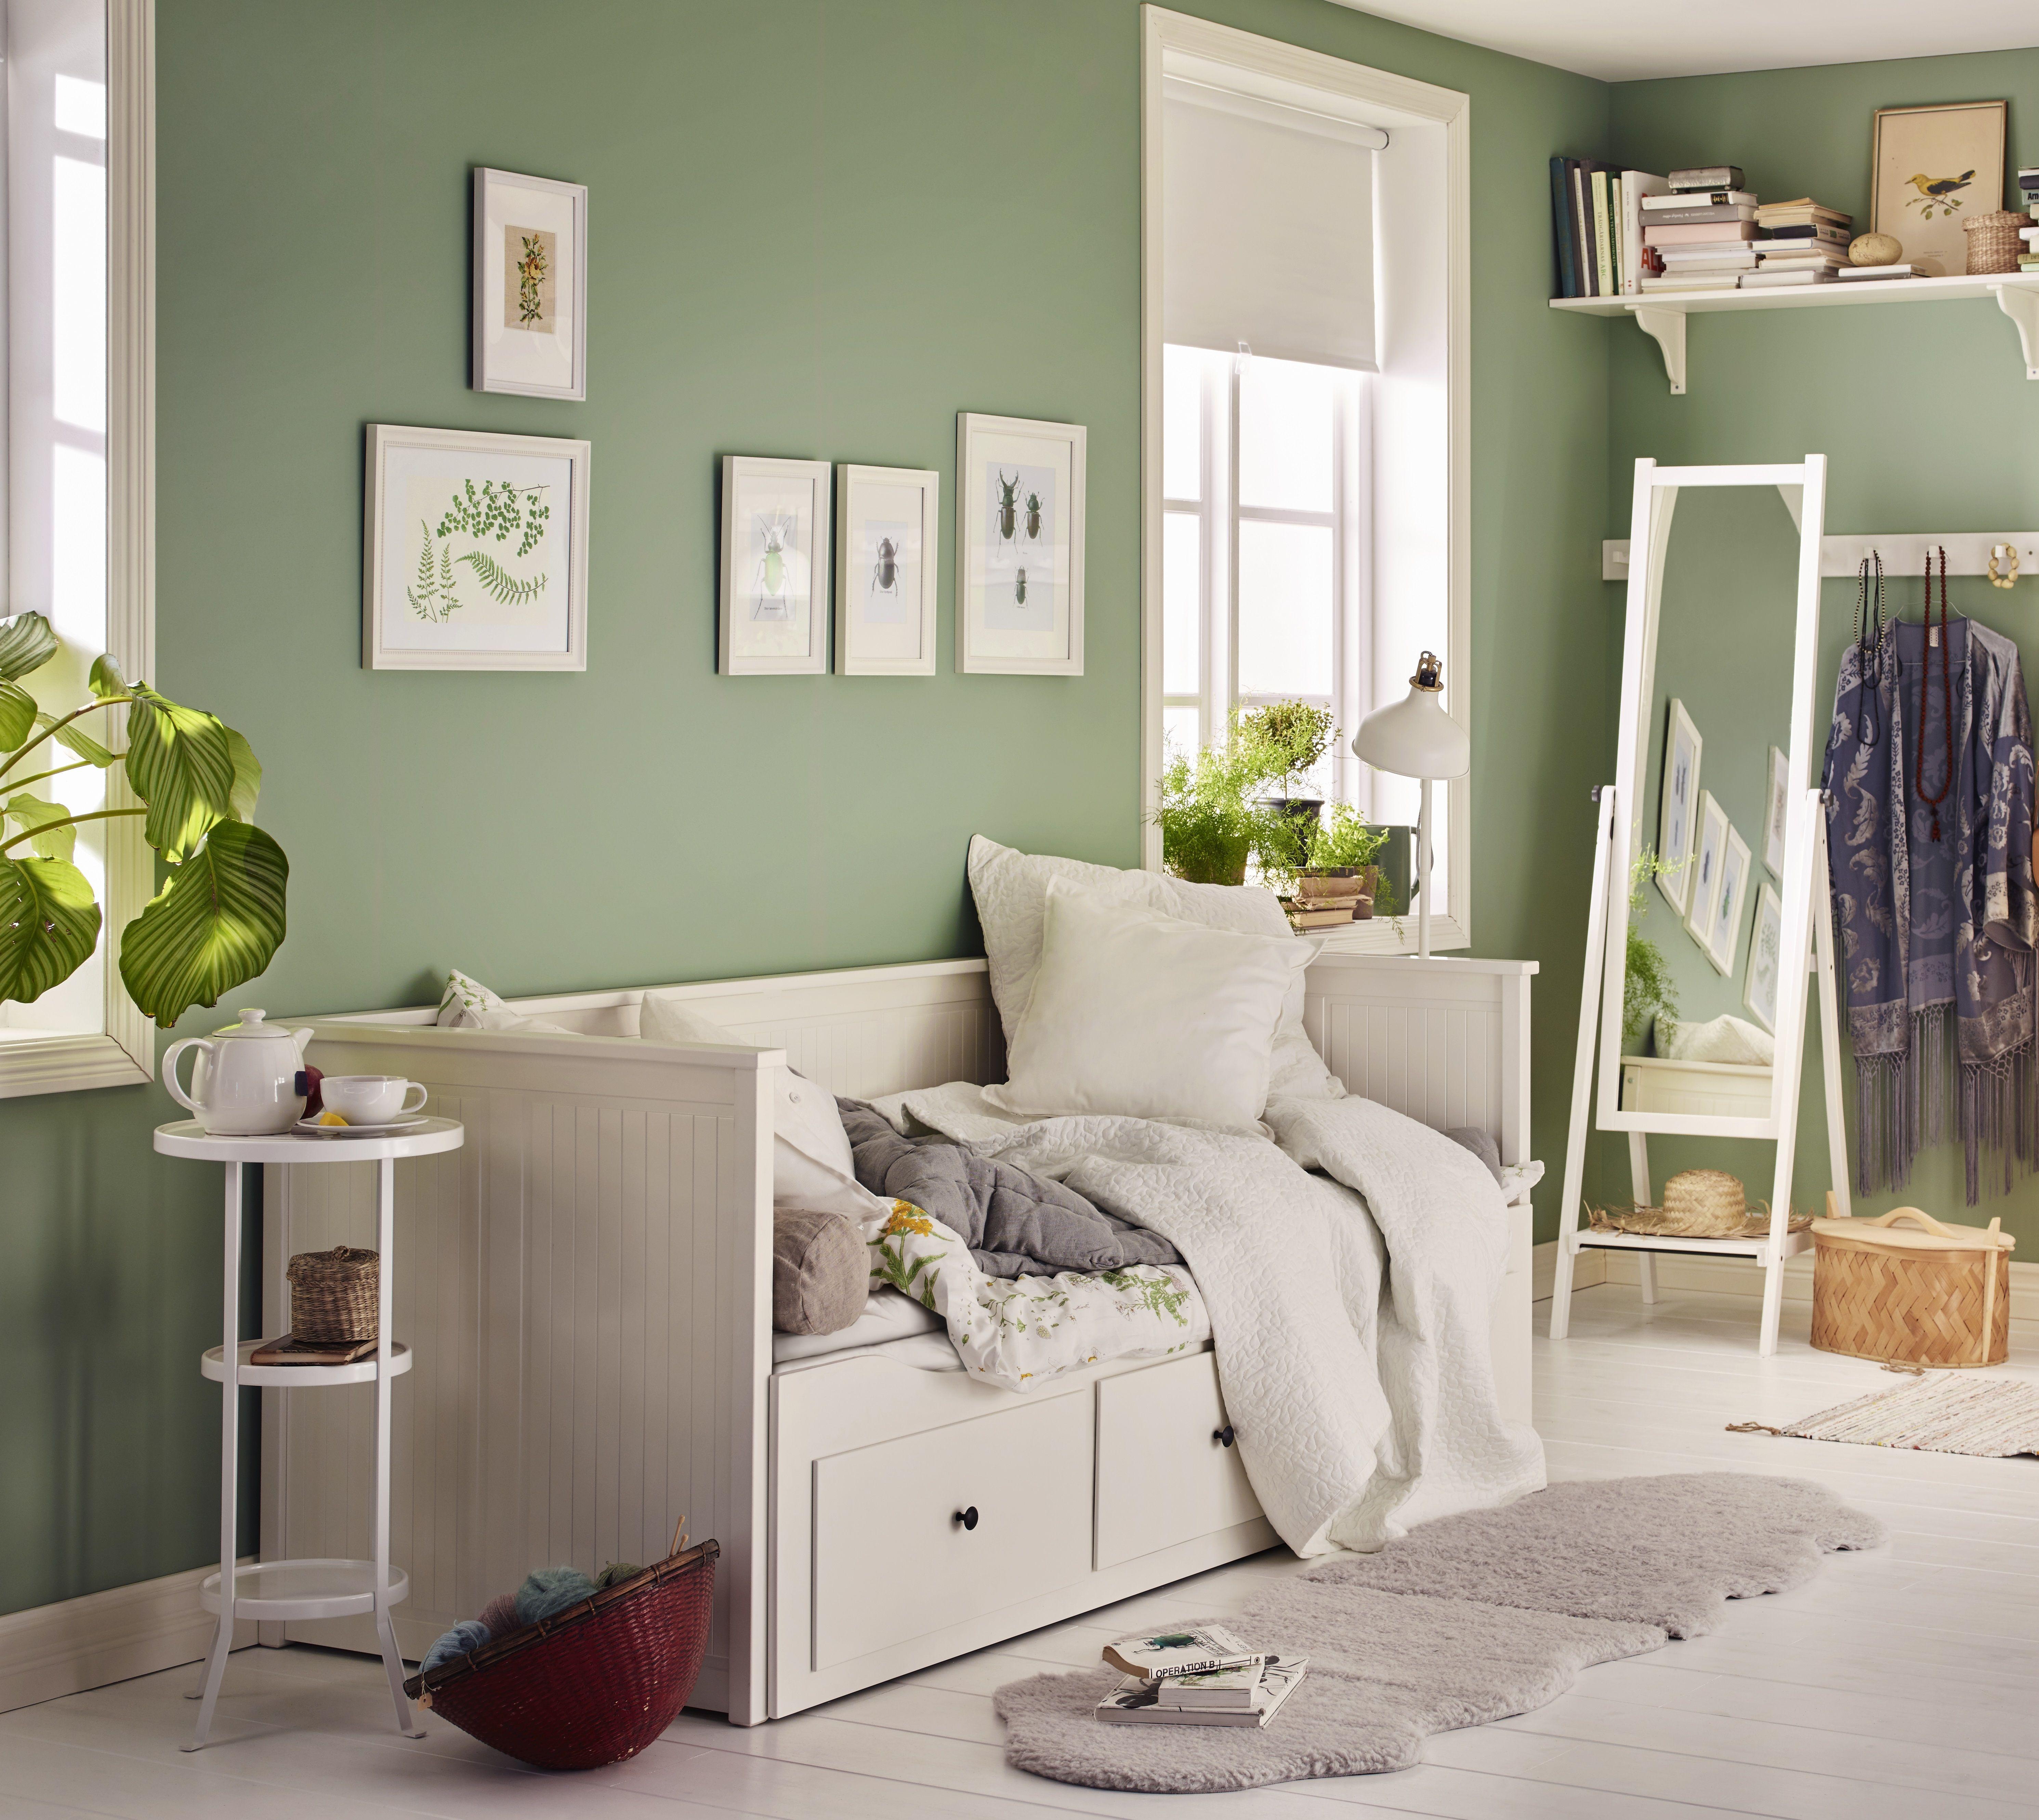 hemnes bedbank ikea ikeanl slaapkamer landelijk wit. Black Bedroom Furniture Sets. Home Design Ideas